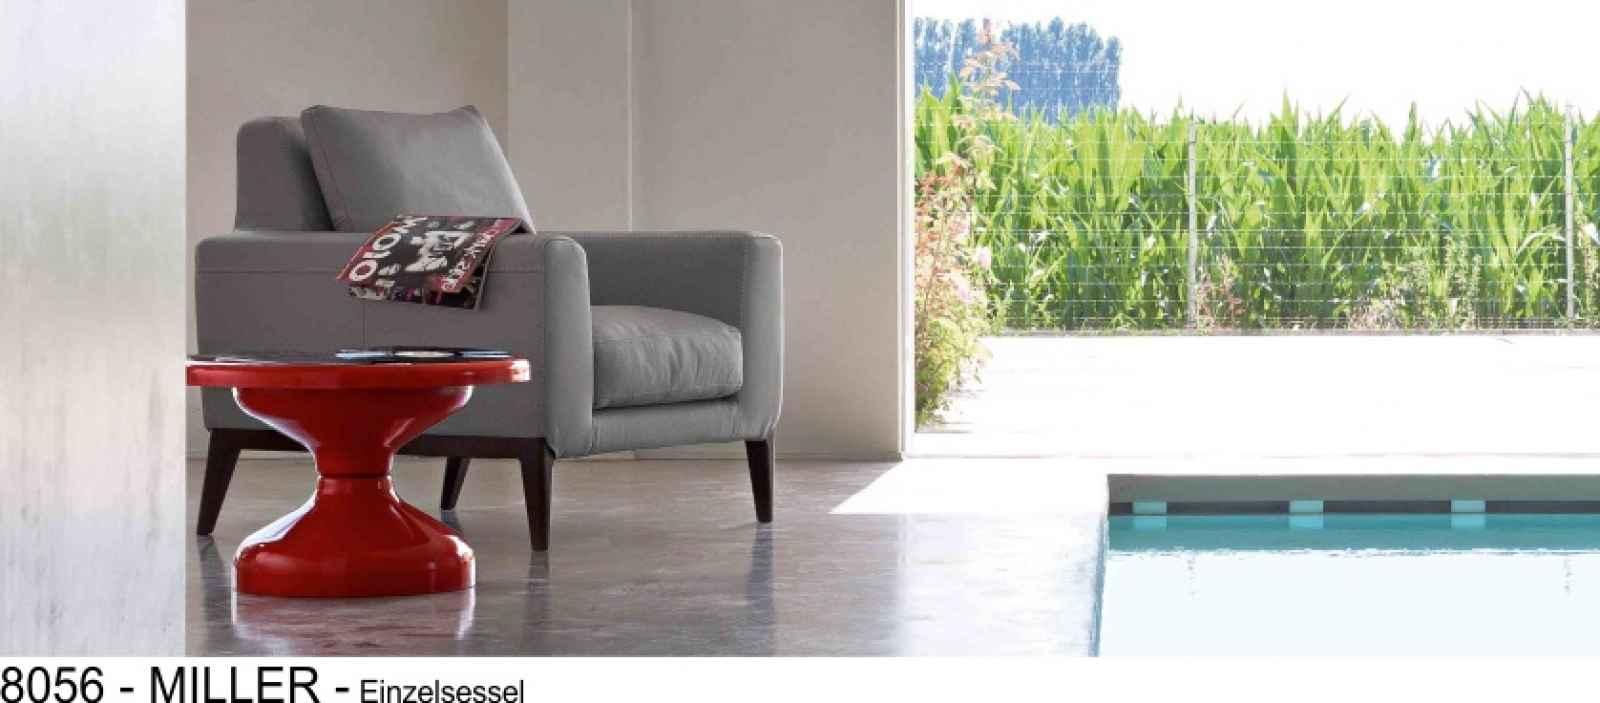 Einzelsessel design  Designersessel in der Design-Lounge - the-lounge-company